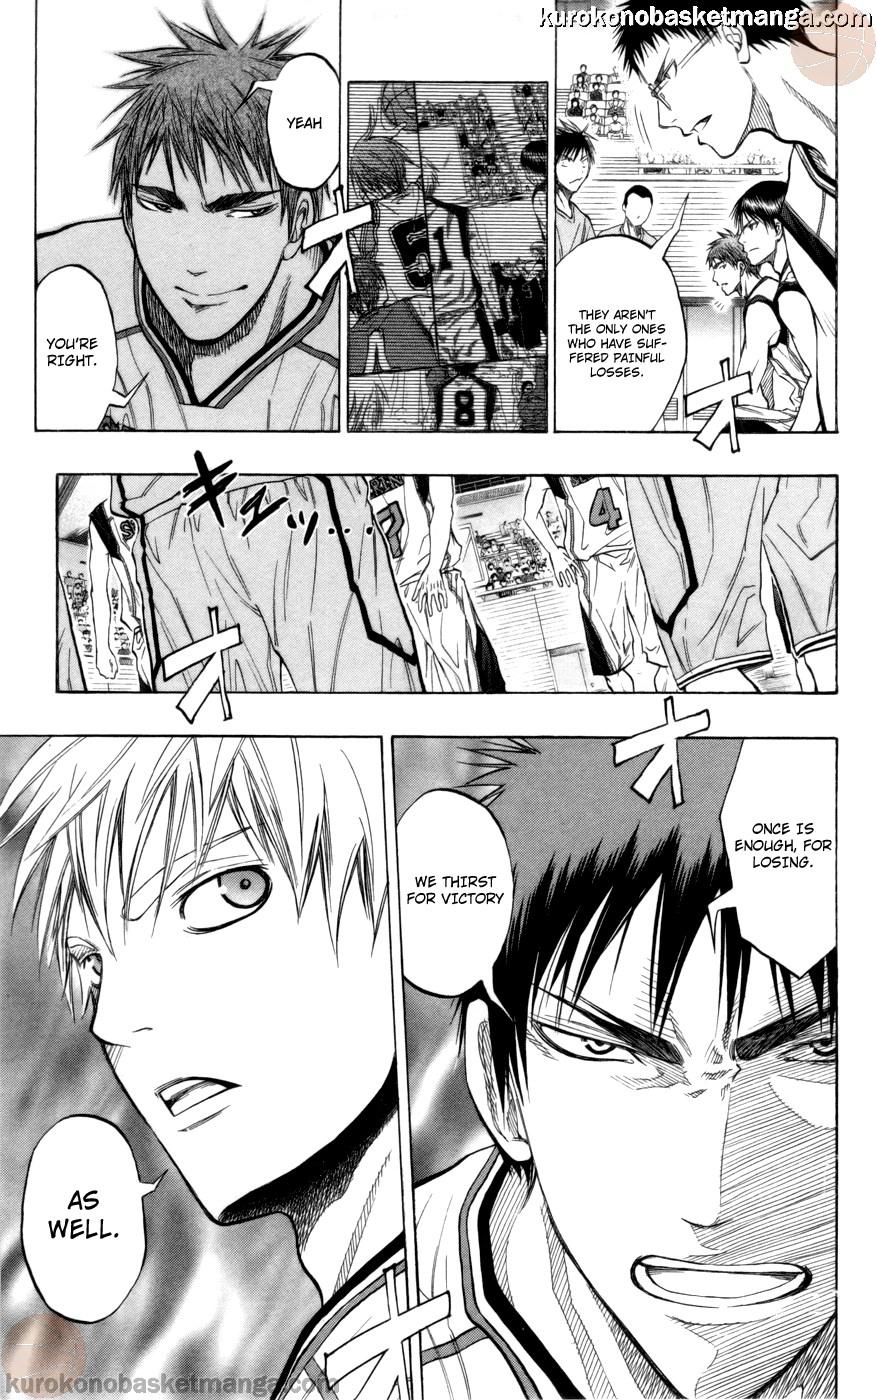 Kuroko no Basket Manga Chapter 85 - Image 19